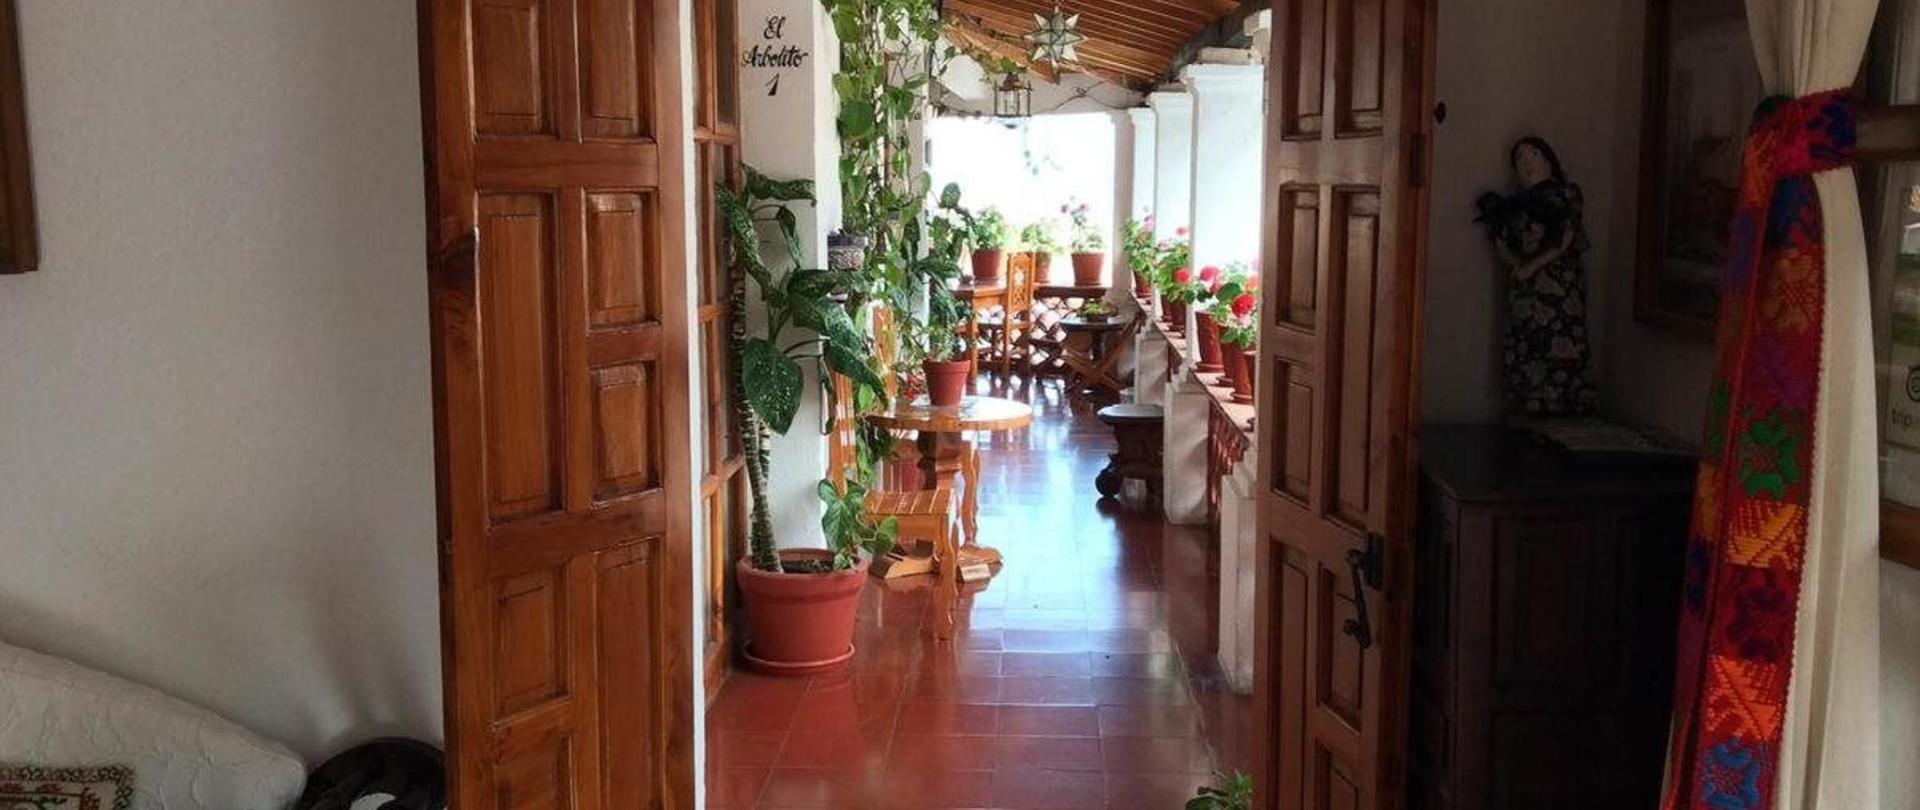 Hallway Hotel Mi Casita